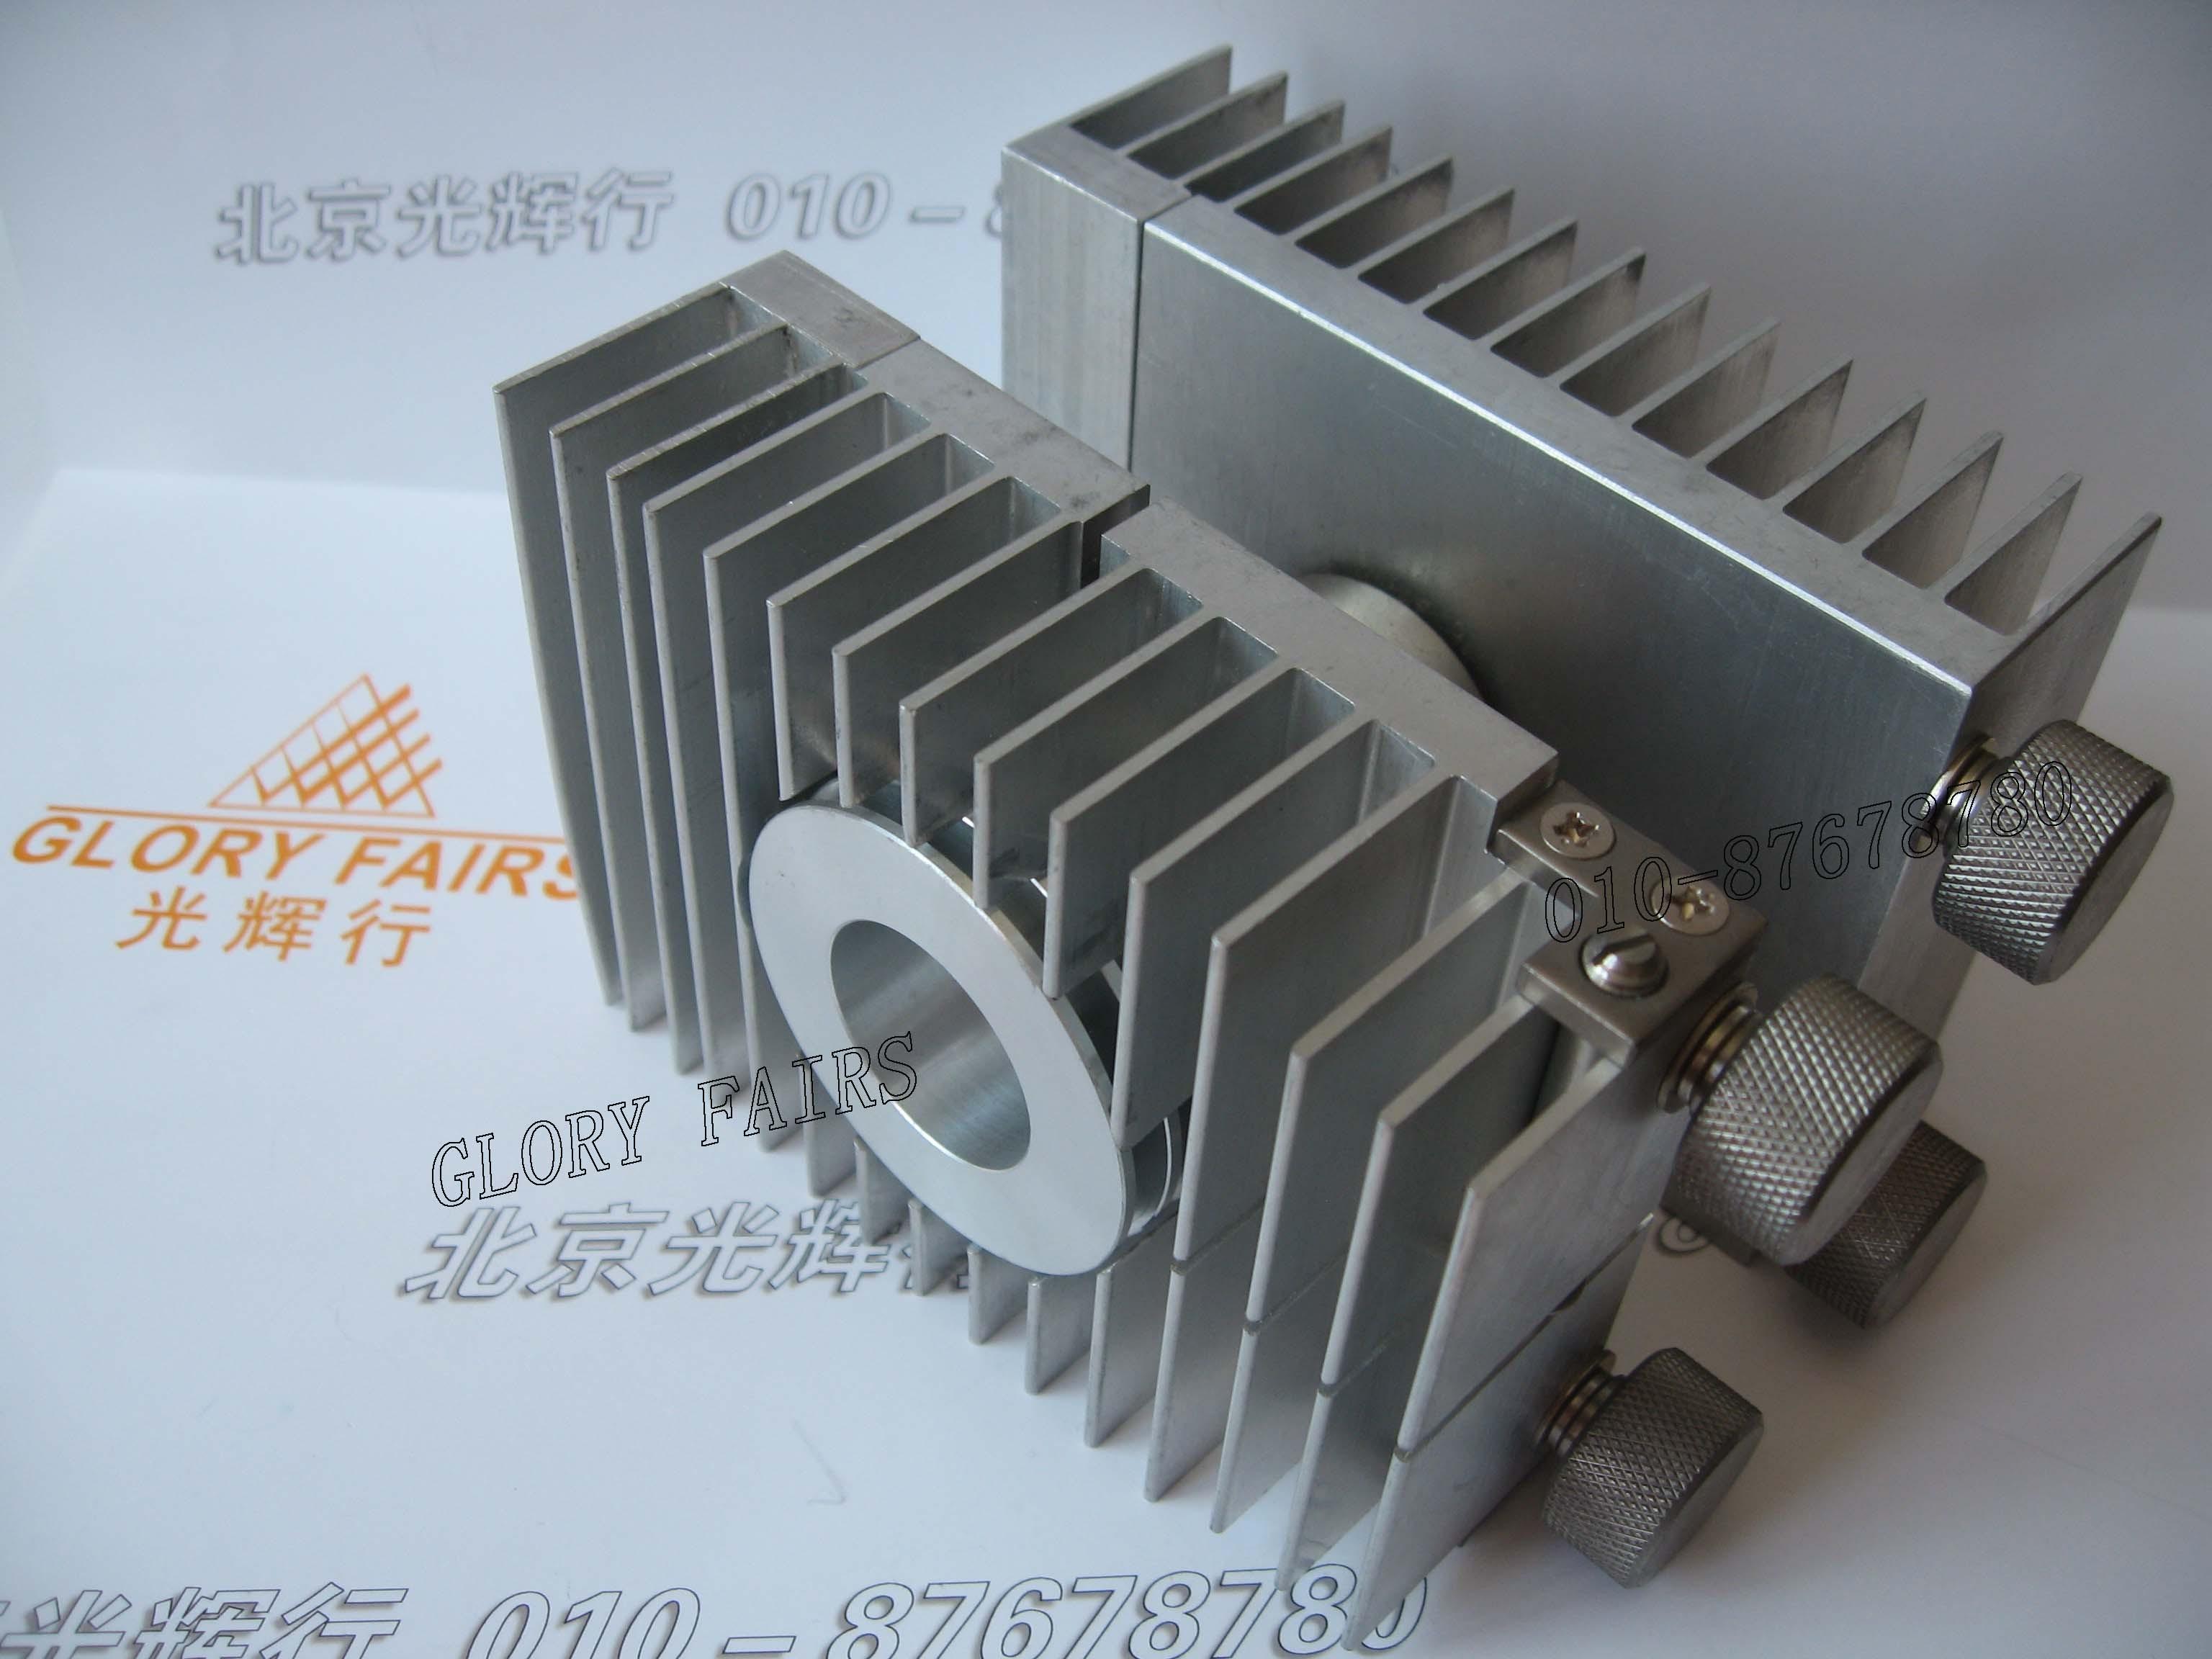 300w xenon arc lamp heat sinker unit,for oem endoscope light source module,projector fiber optic illuminator,300W bulb(China (Mainland))